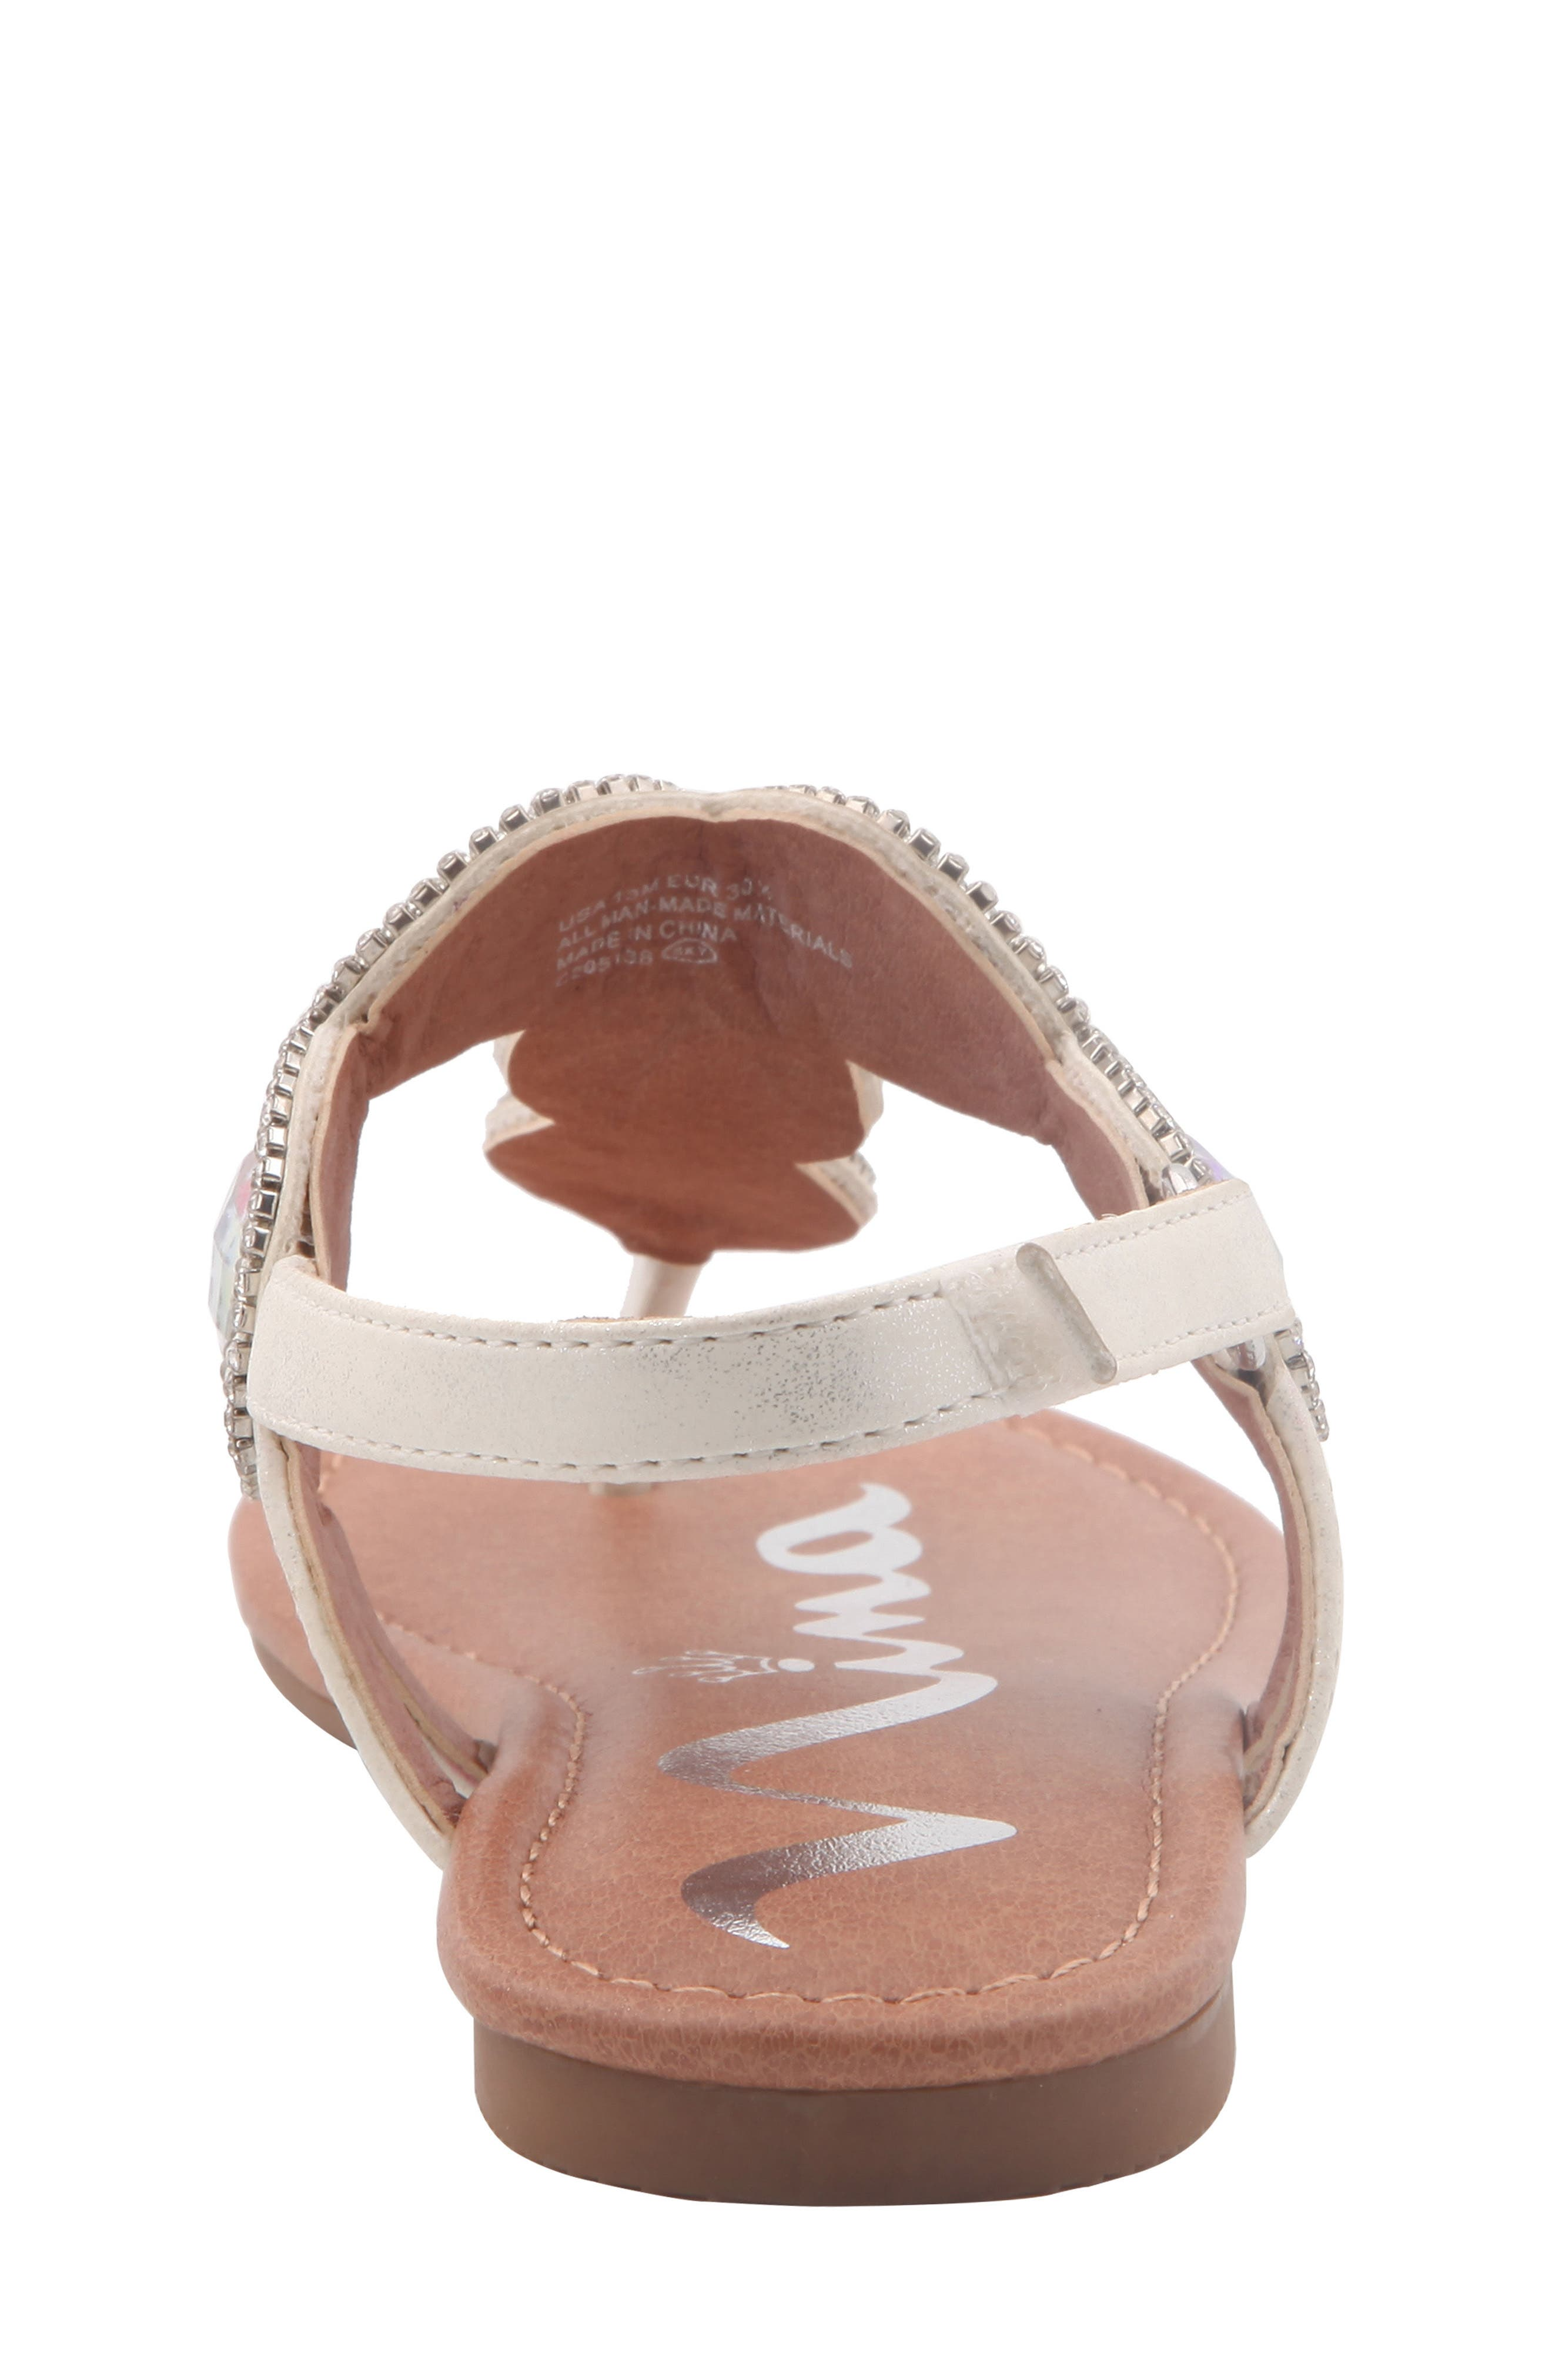 Elicia Embellished T-Strap Sandal,                             Alternate thumbnail 7, color,                             SILVER METALLIC